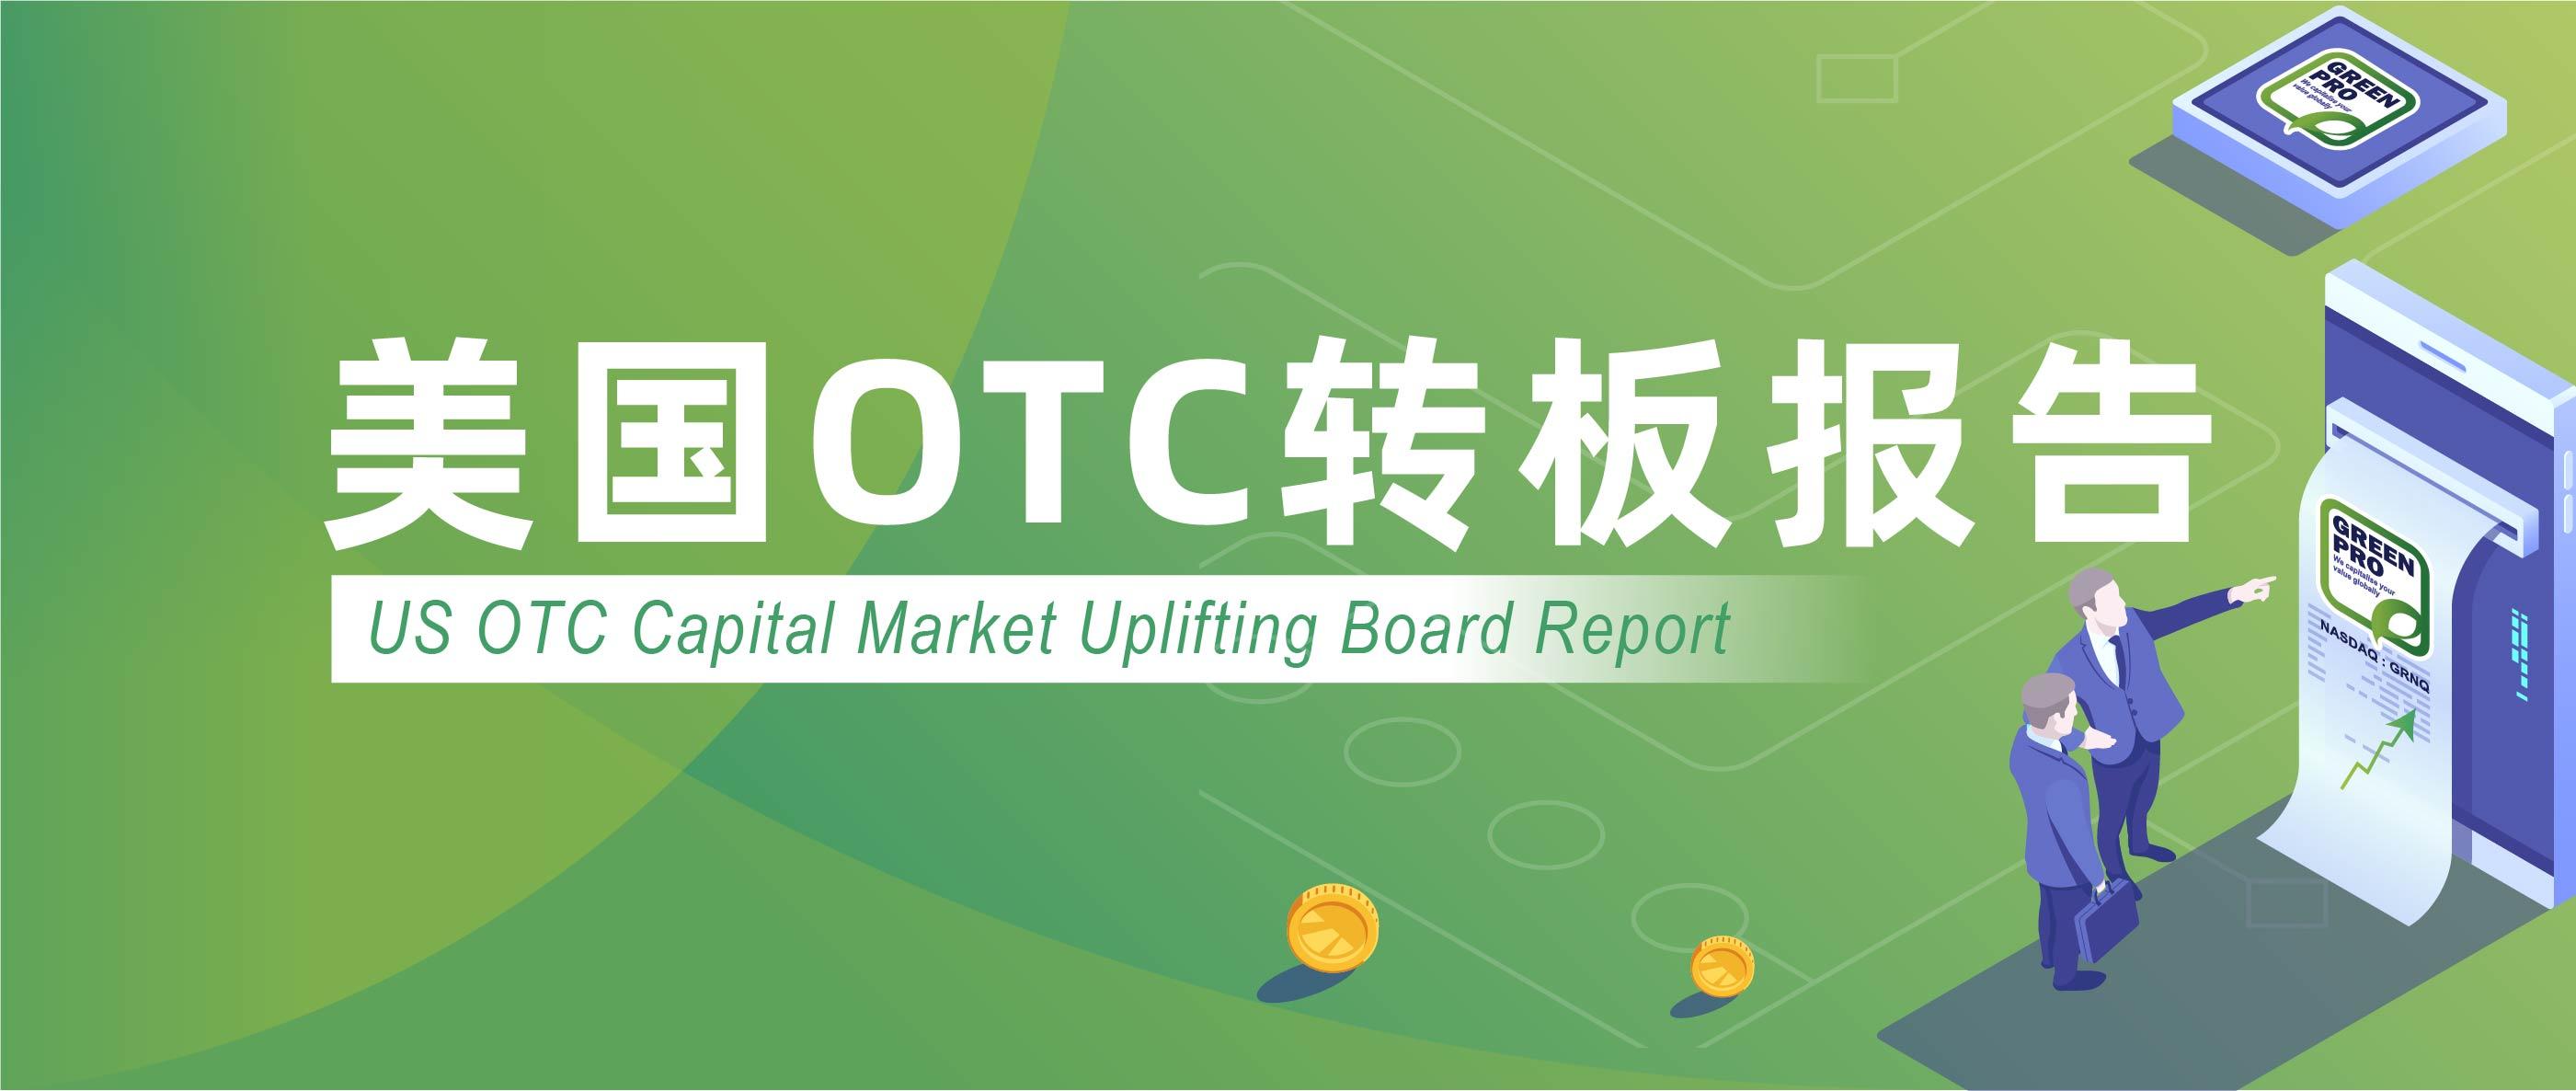 et41796251019501 - 美国OTC市场丨2021年1月新上市及转板(升主板)数据-香港上市